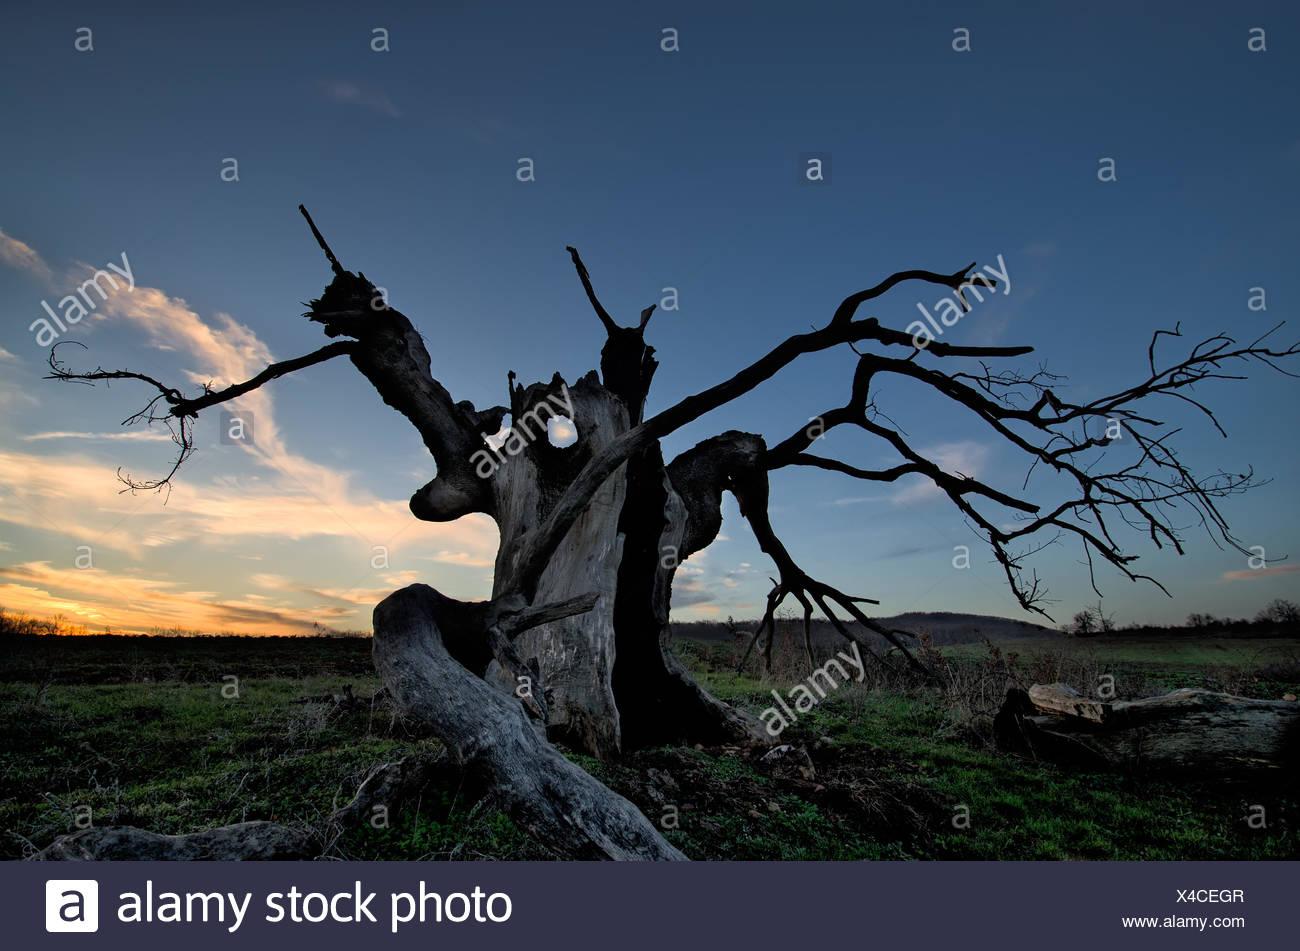 The creepy tree - Stock Image